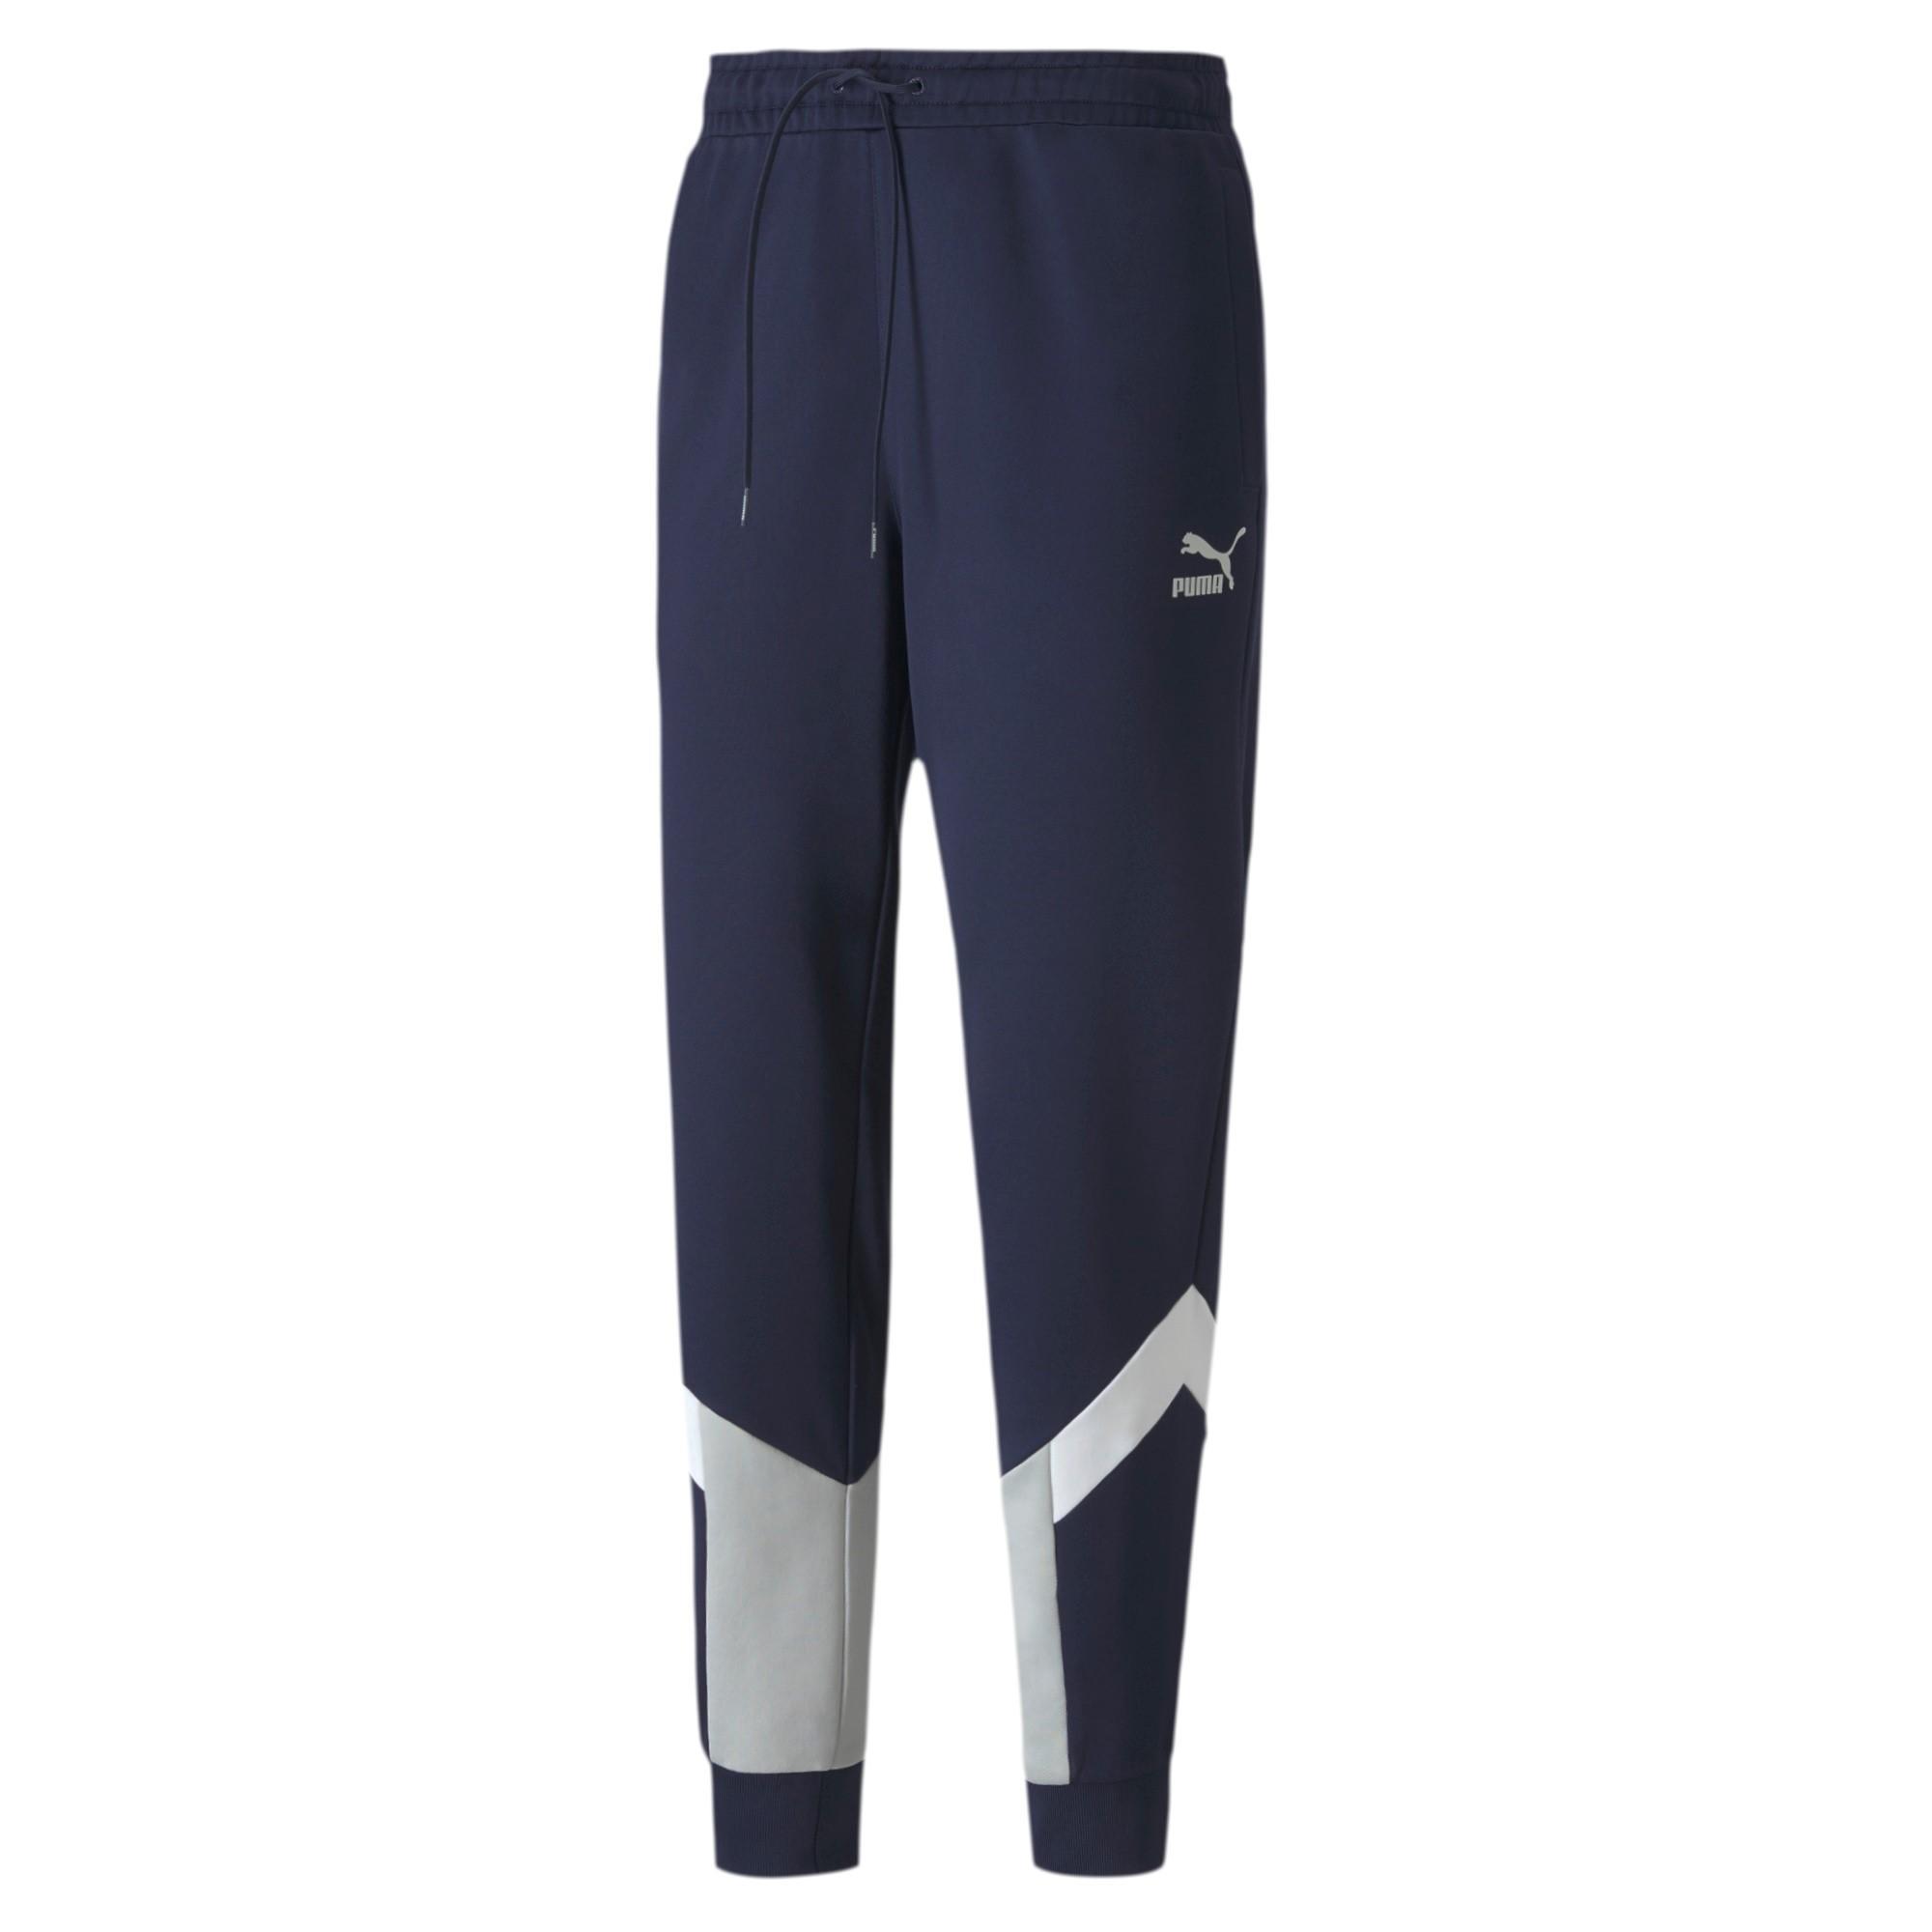 Pantaloni Figc Iconic Mcs